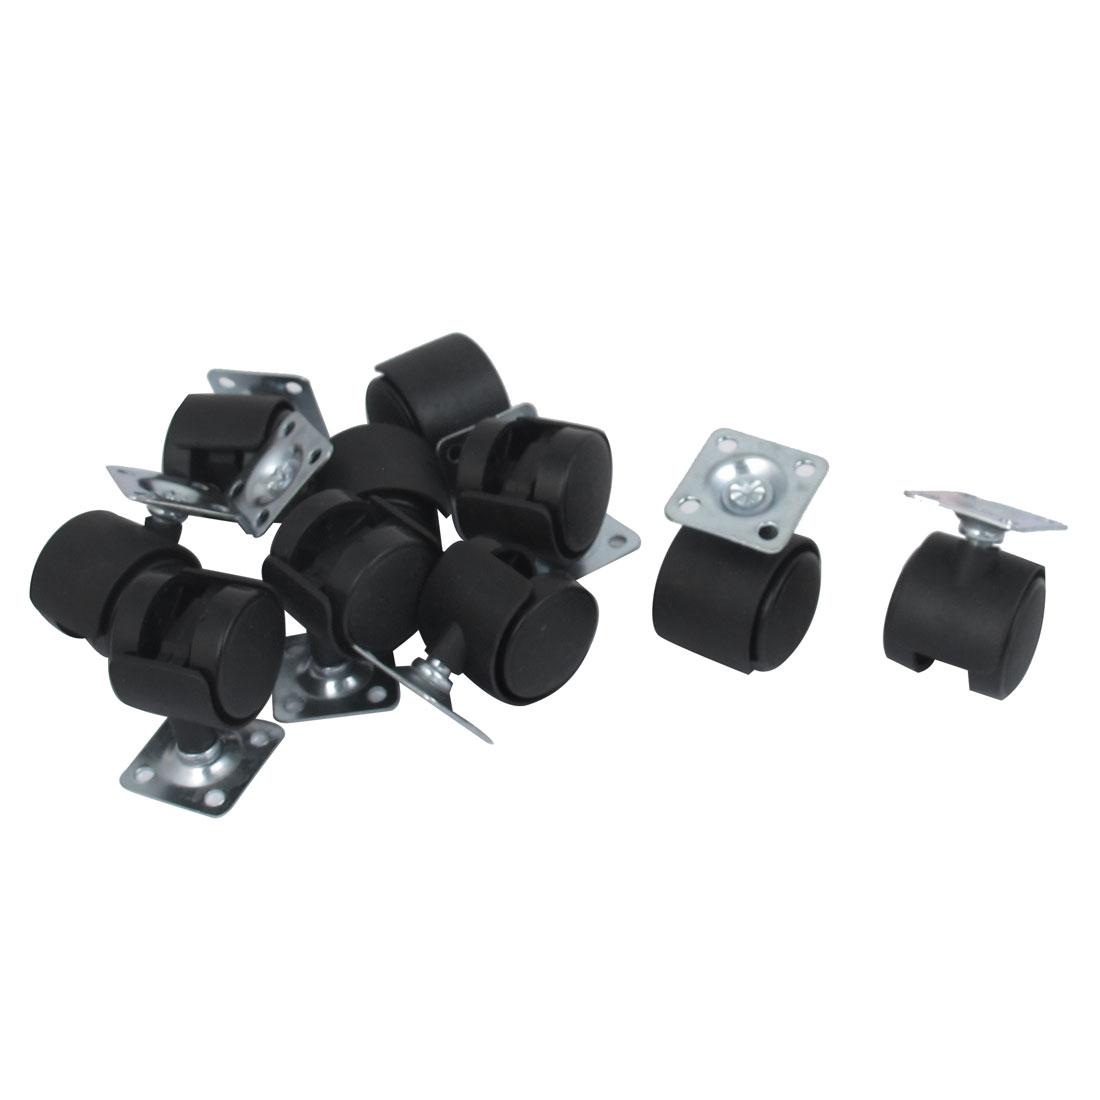 "1"" Dia Plastic Wheel Metal Top Plate Swivel Ball Bearing Casters 10 Pcs"